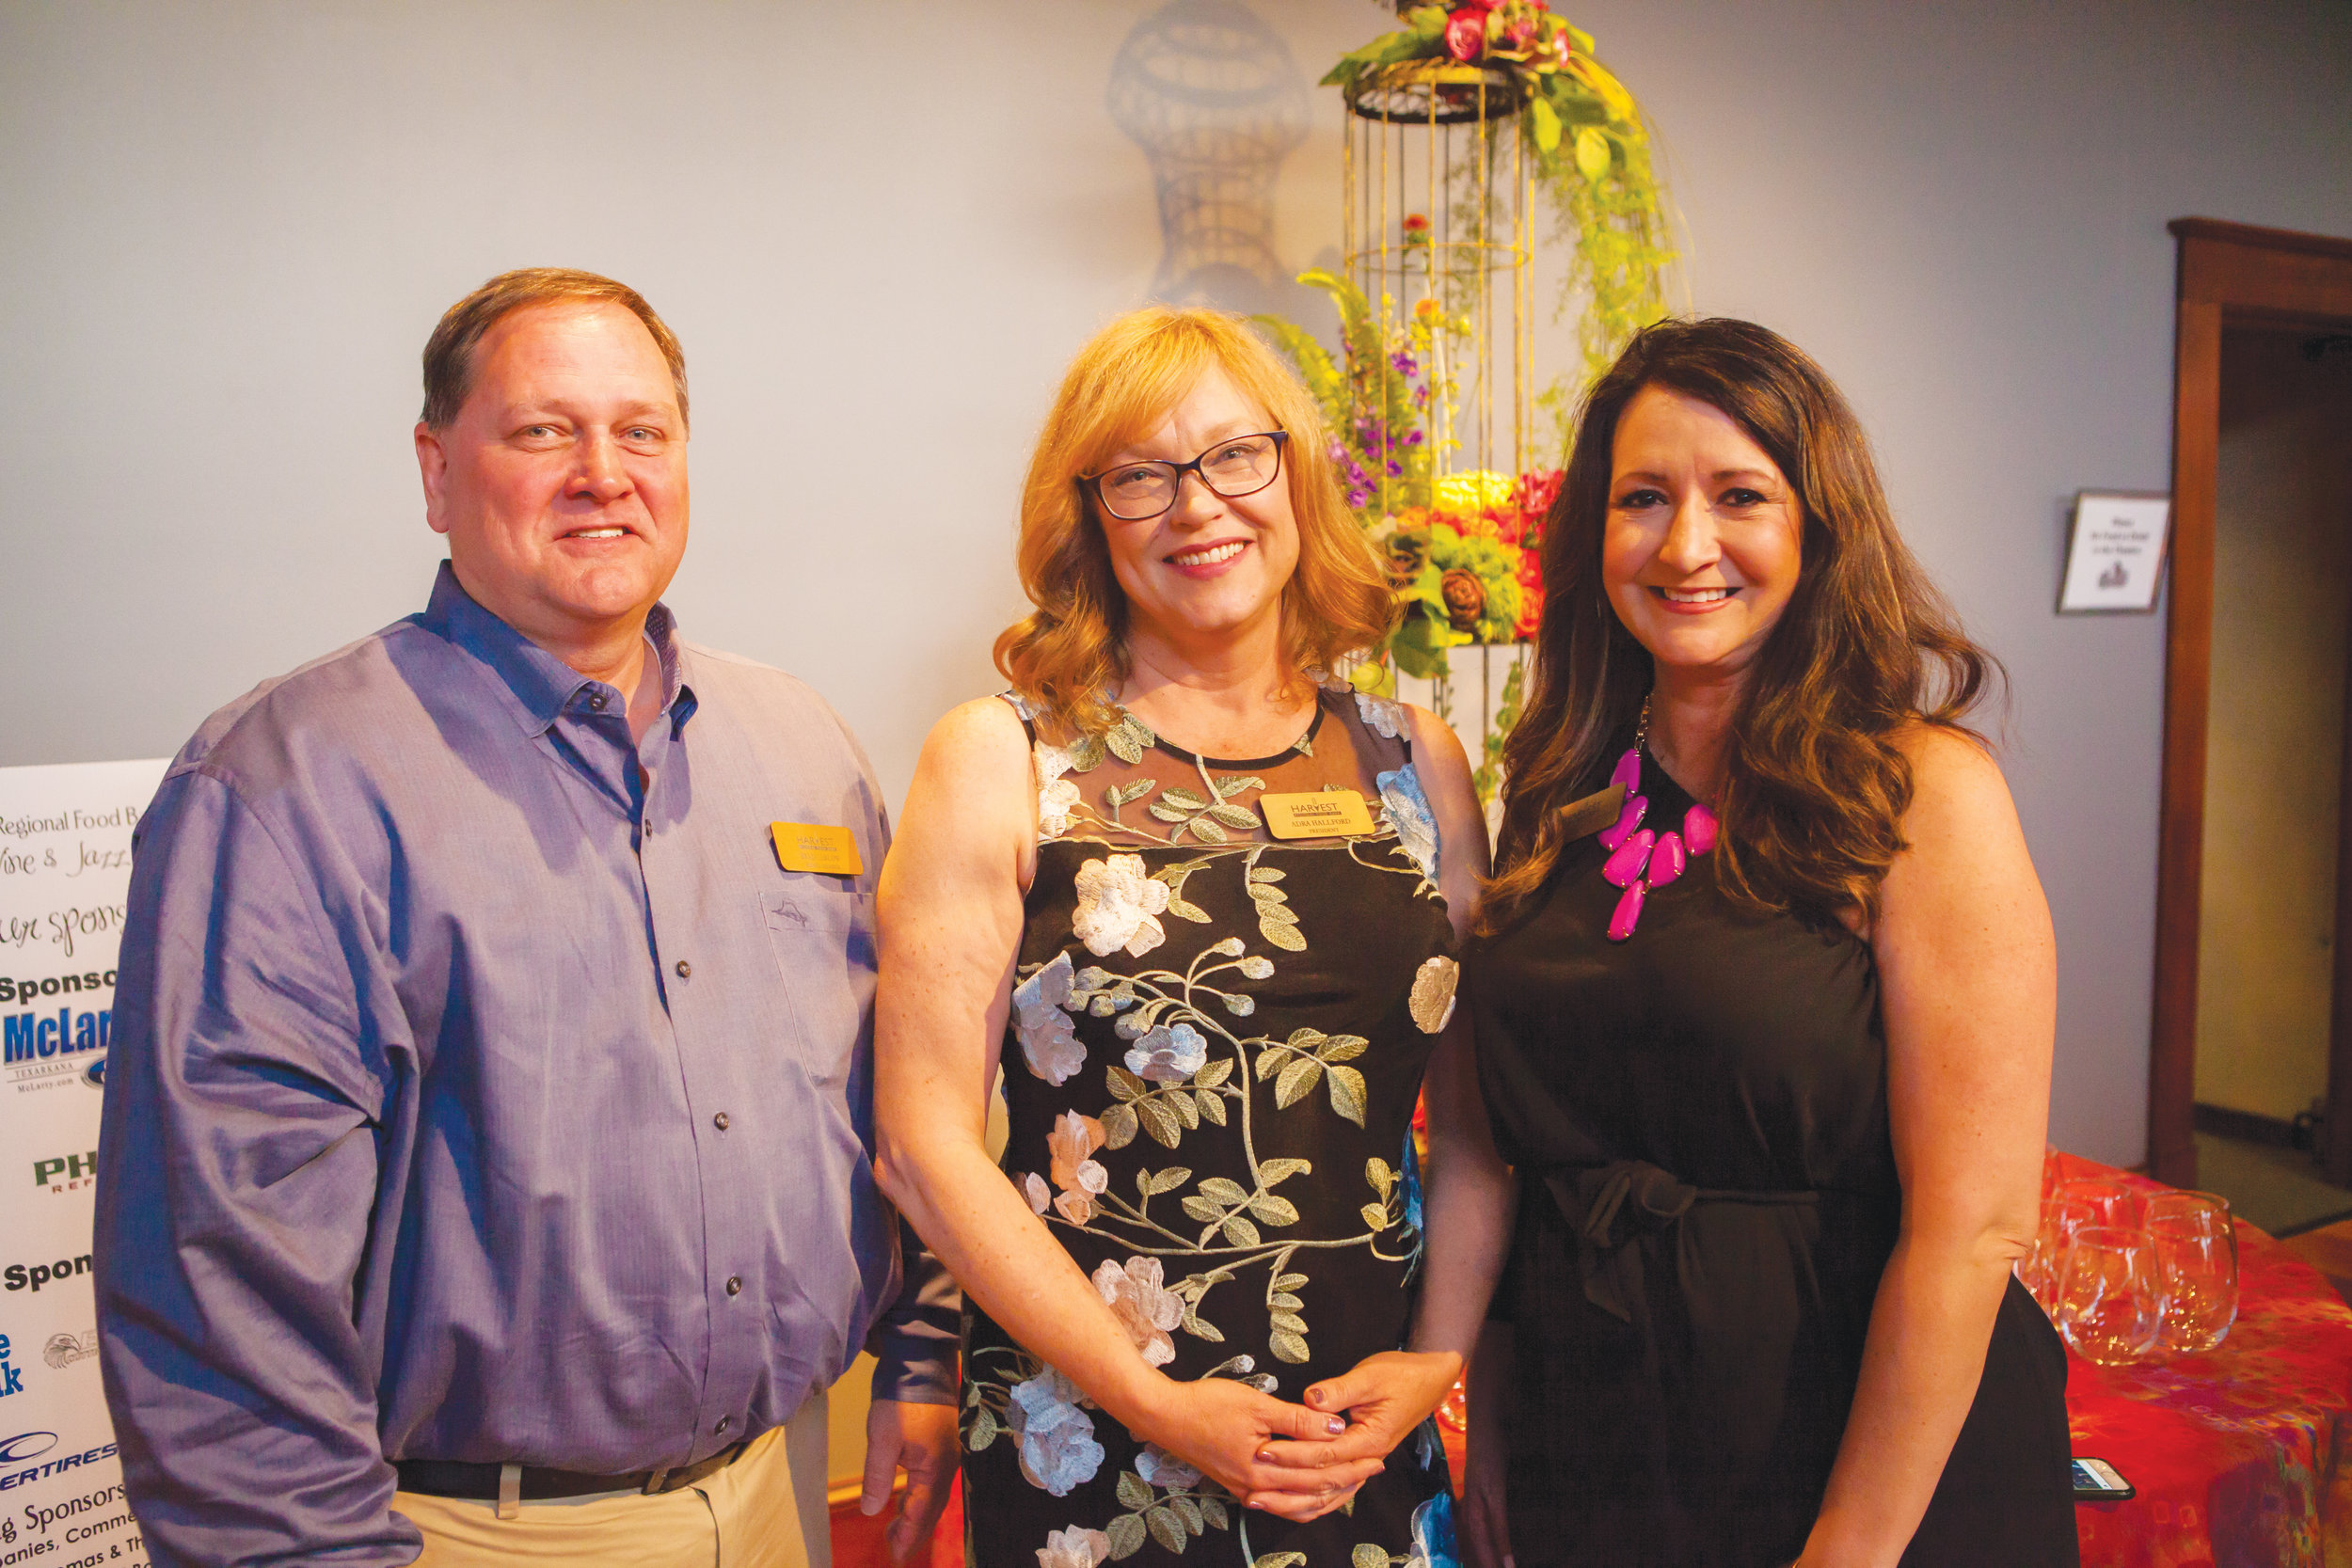 Brad Carlow, Adra Hallford and Camille Wrinkle